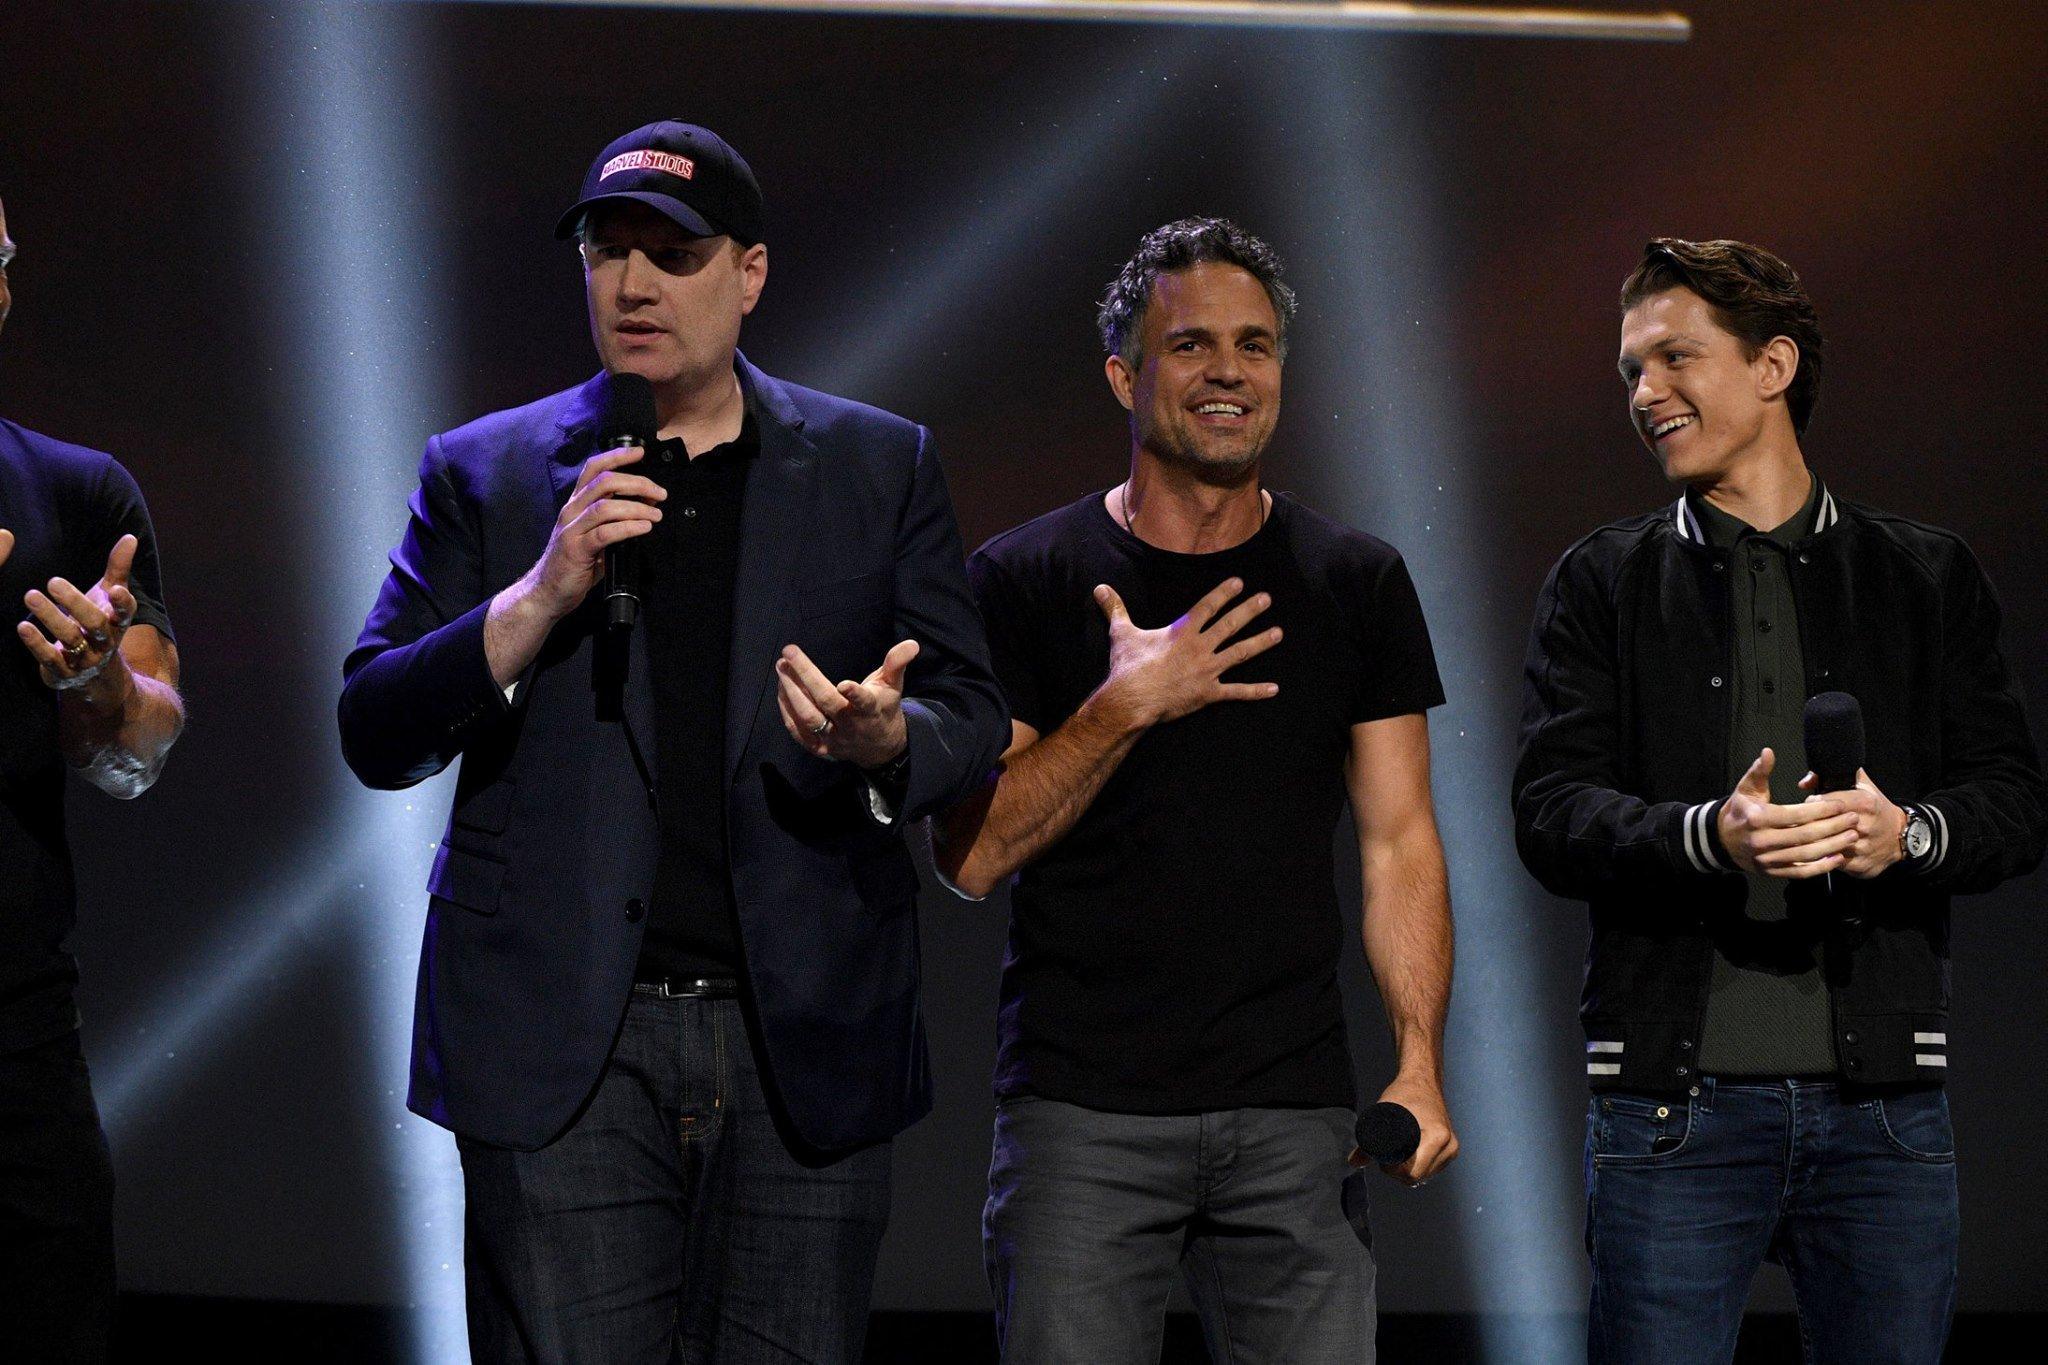 Photo du film Avengers: Infinity War au D23 2017 avec Kevin Feige, Hulk et Spider-Man